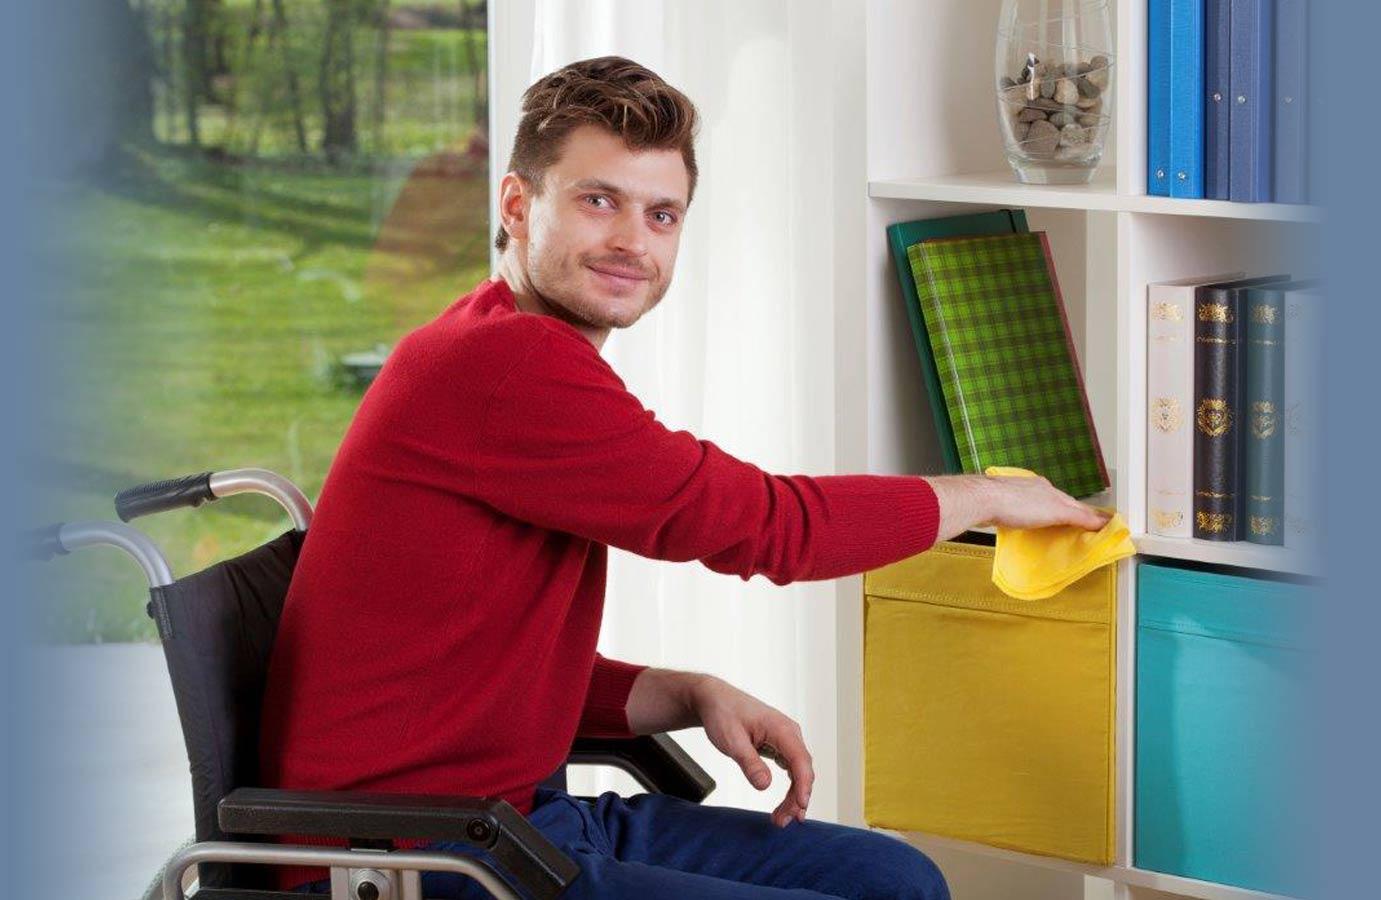 Disability Help Testimonials mobile image - Testimonials